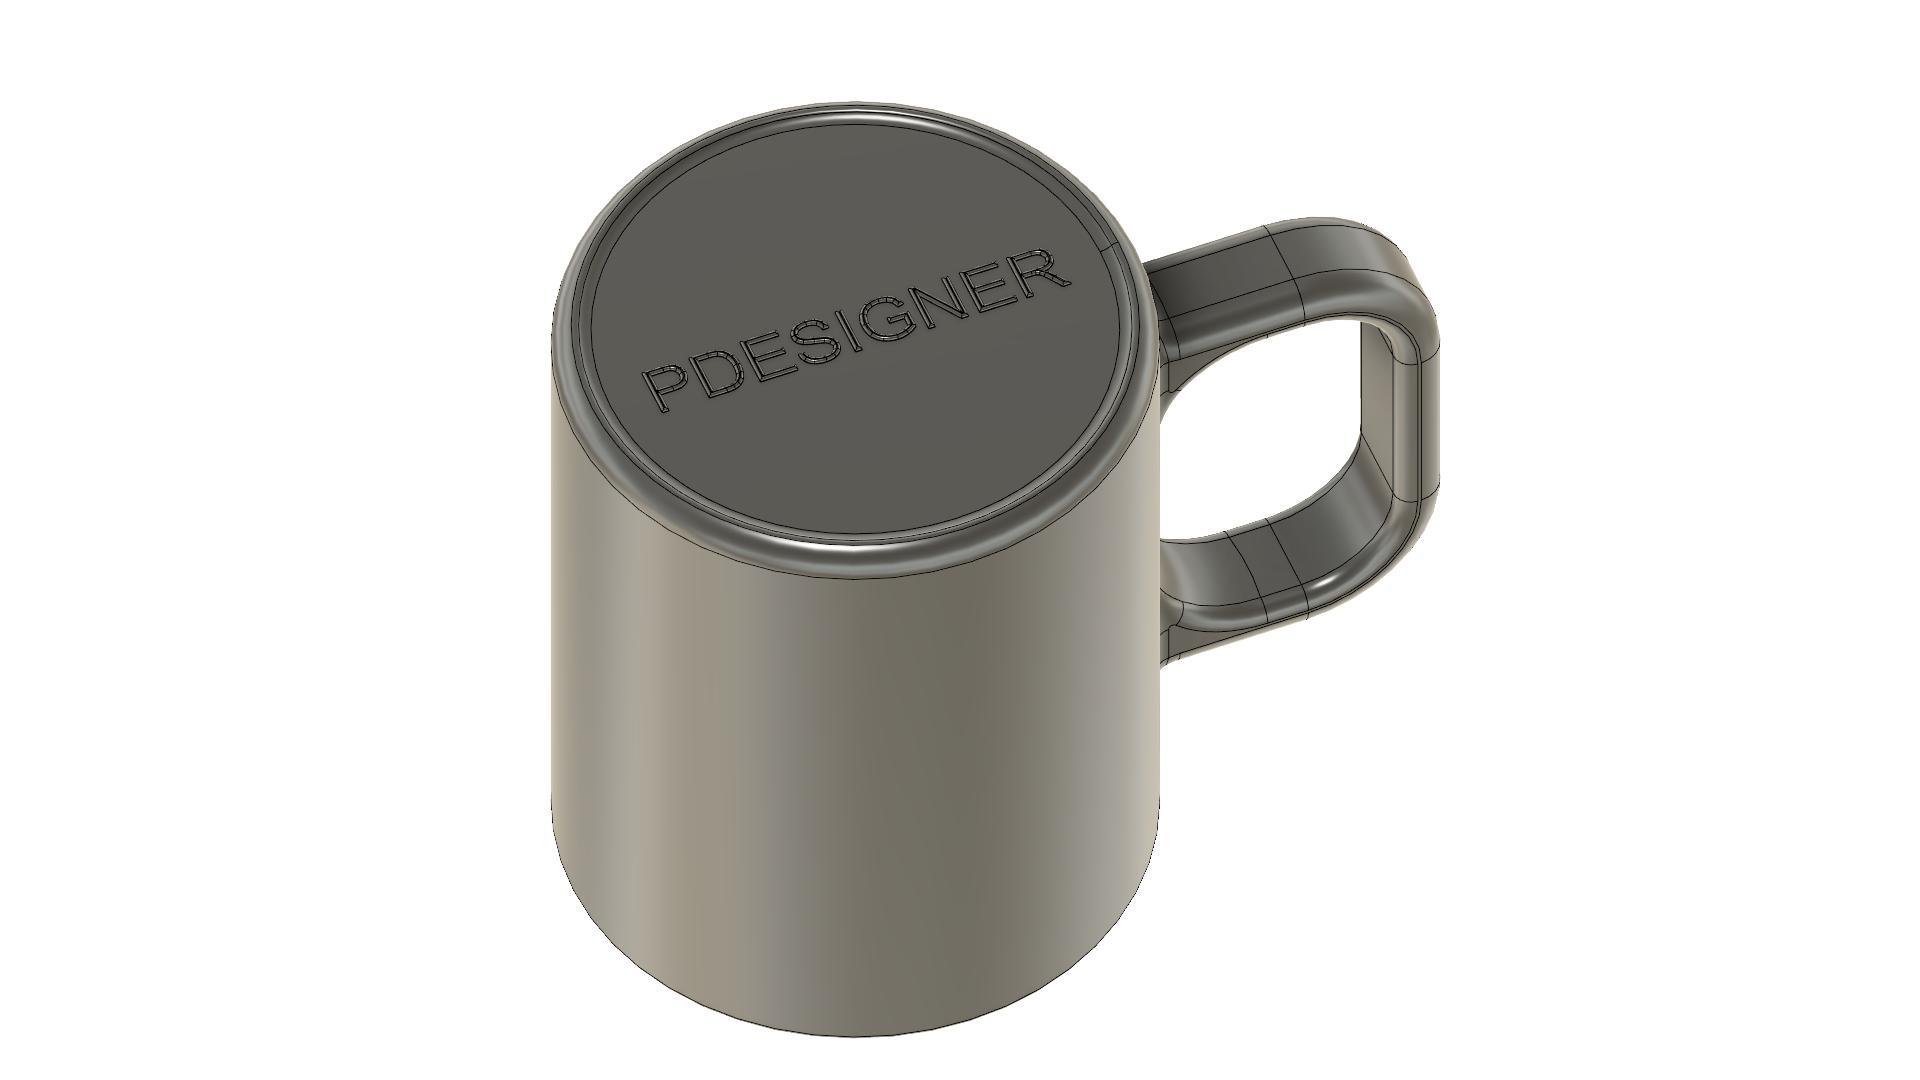 Kubek by Pdesigner v3.jpg Download free STL file Styling Mug for Coffee & Tea • Template to 3D print, PDesigner